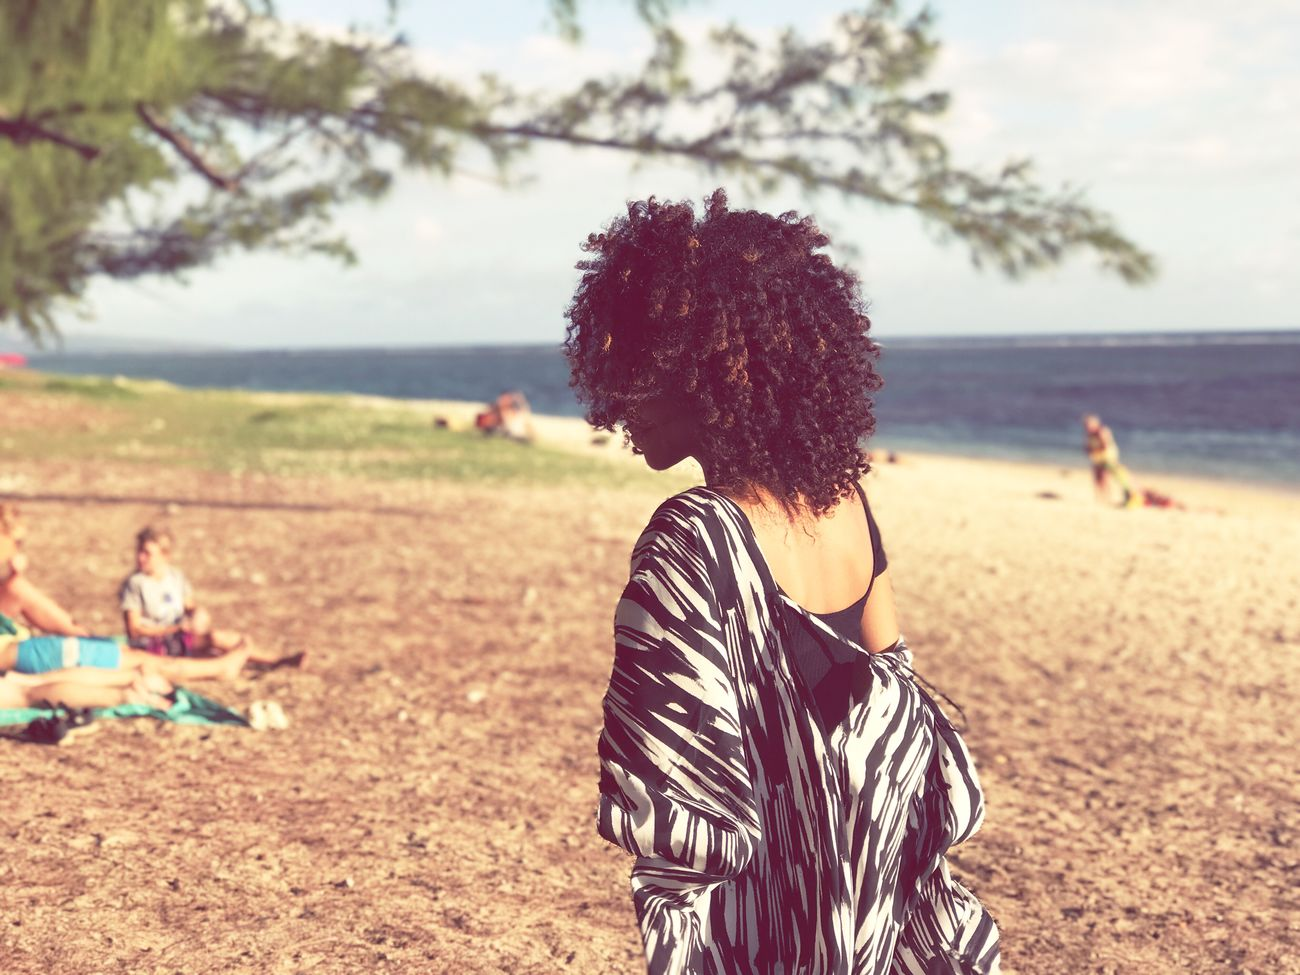 Beach Lifestyles Outdoors Women Day First Eyeem Photo